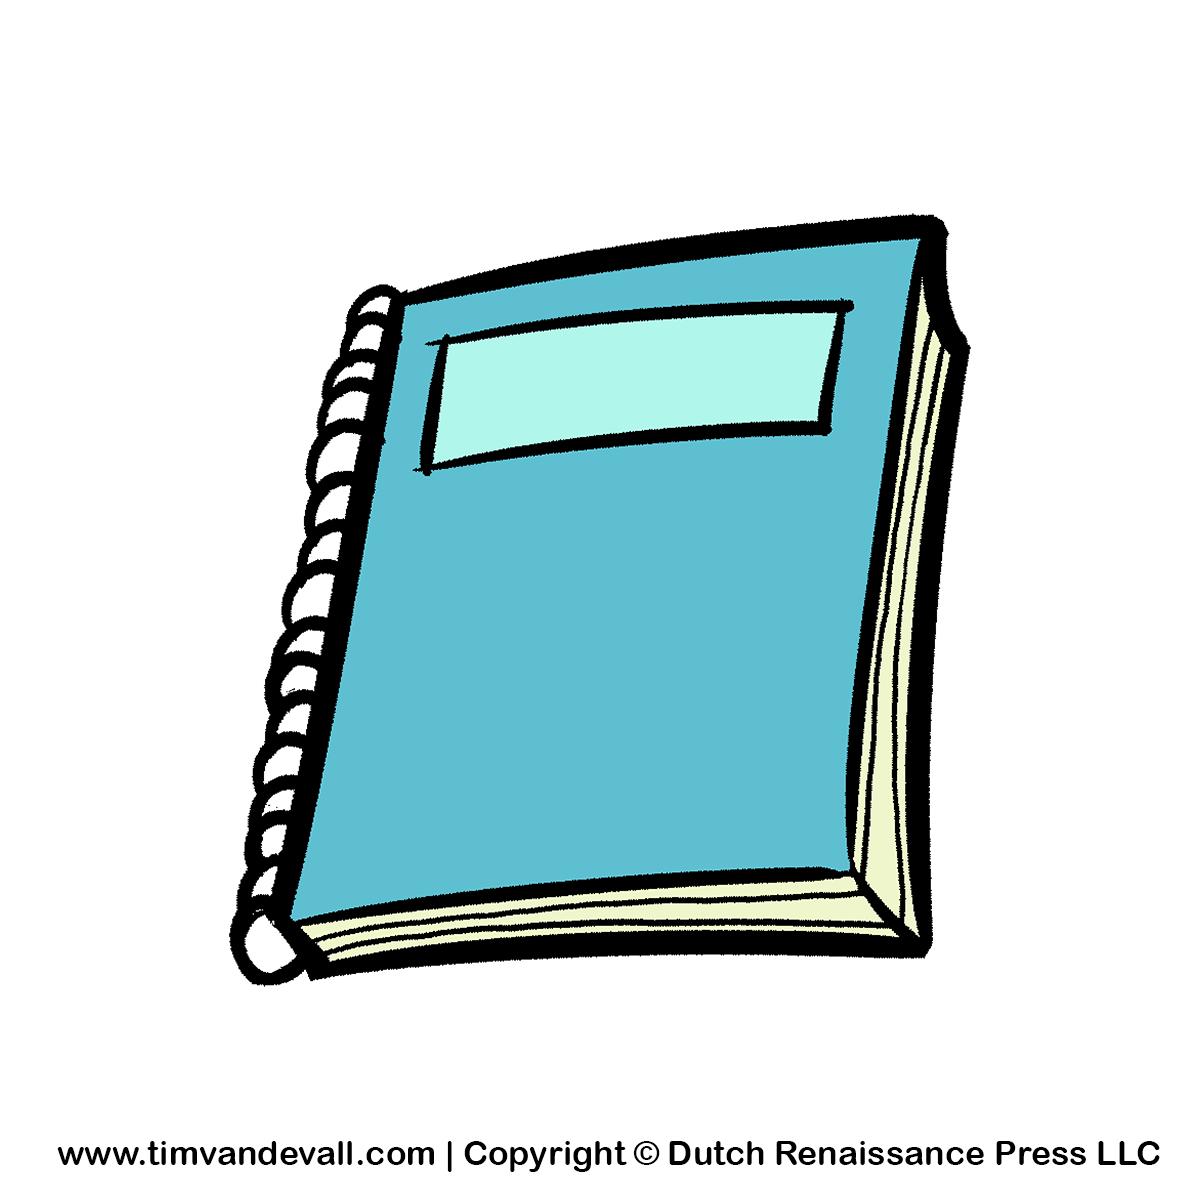 Notebook Clipart & Clip Art Images #31460.